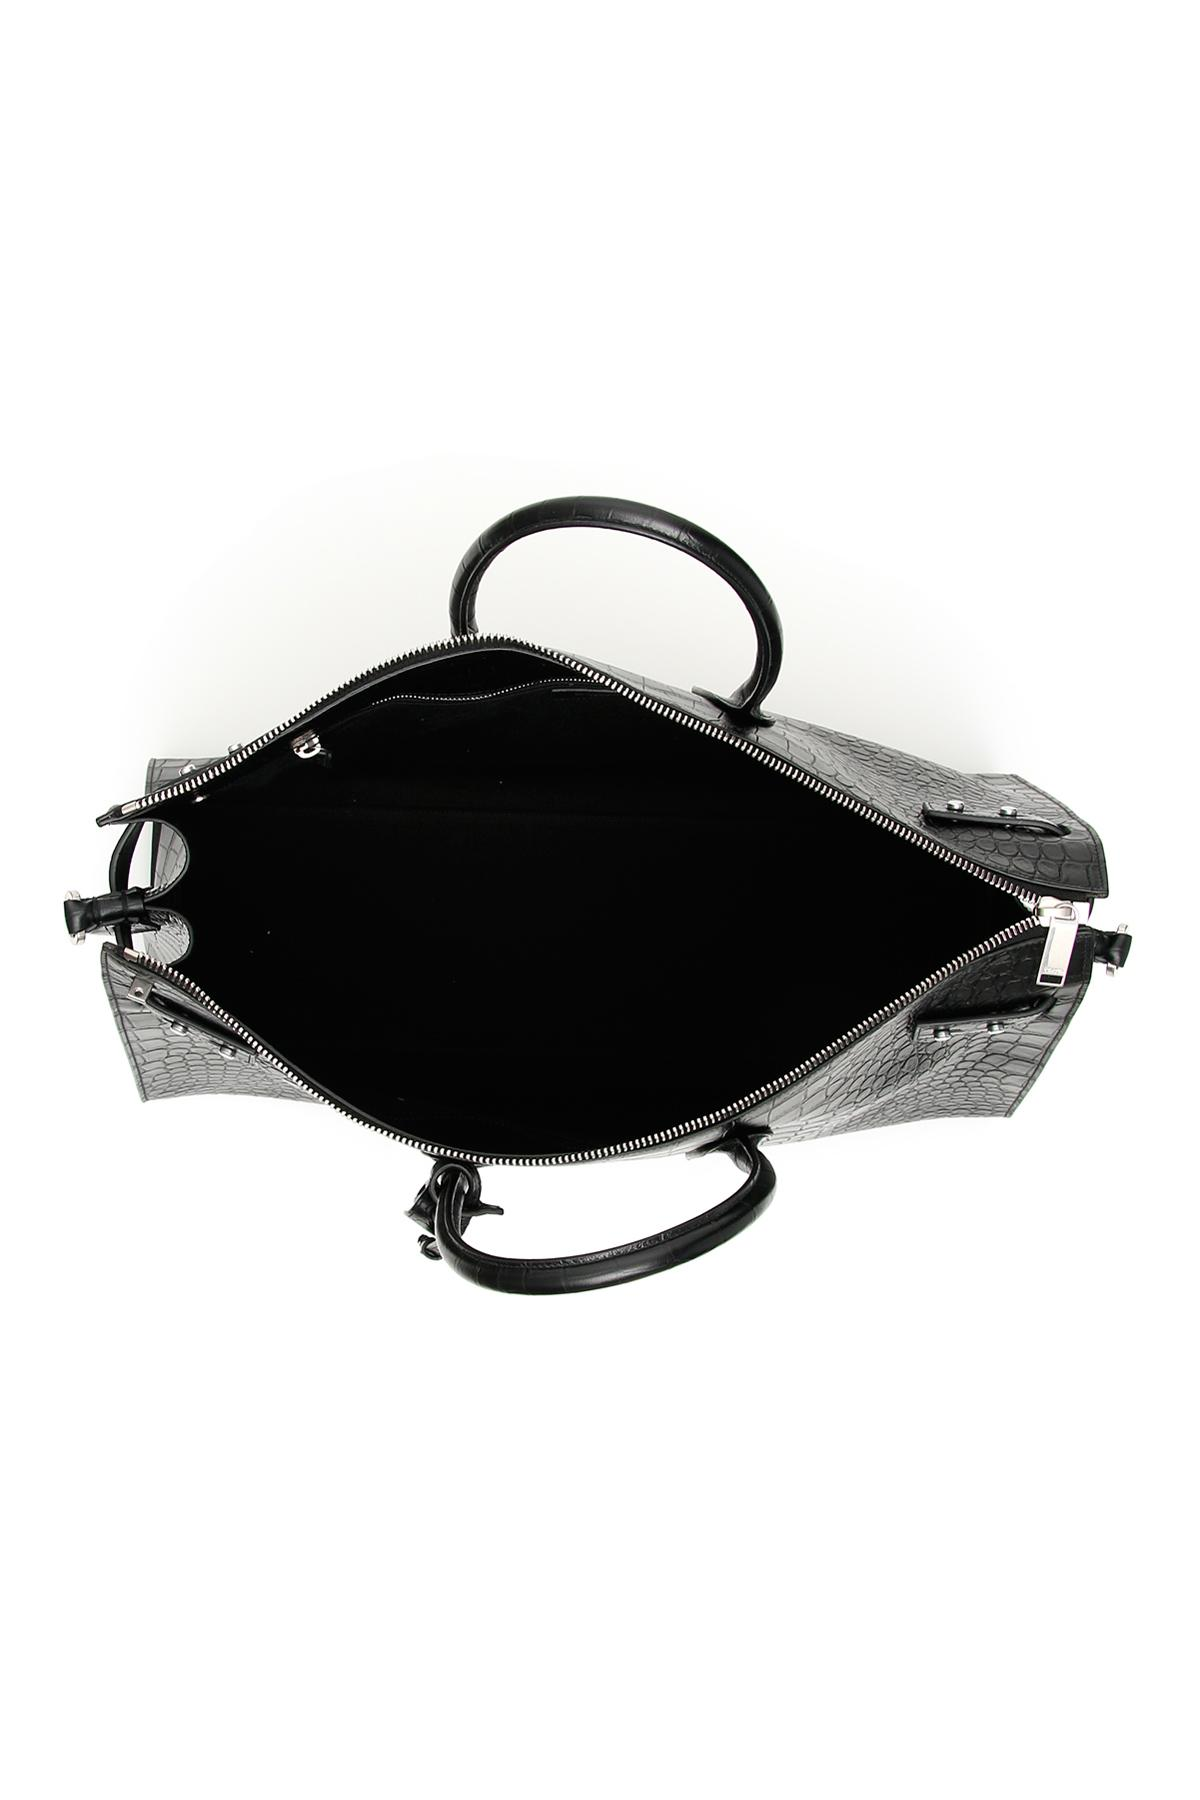 Saint Laurent - Black Sac De Jour 48h Duffle Bag for Men - Lyst. View  fullscreen 6663b02c7d91b